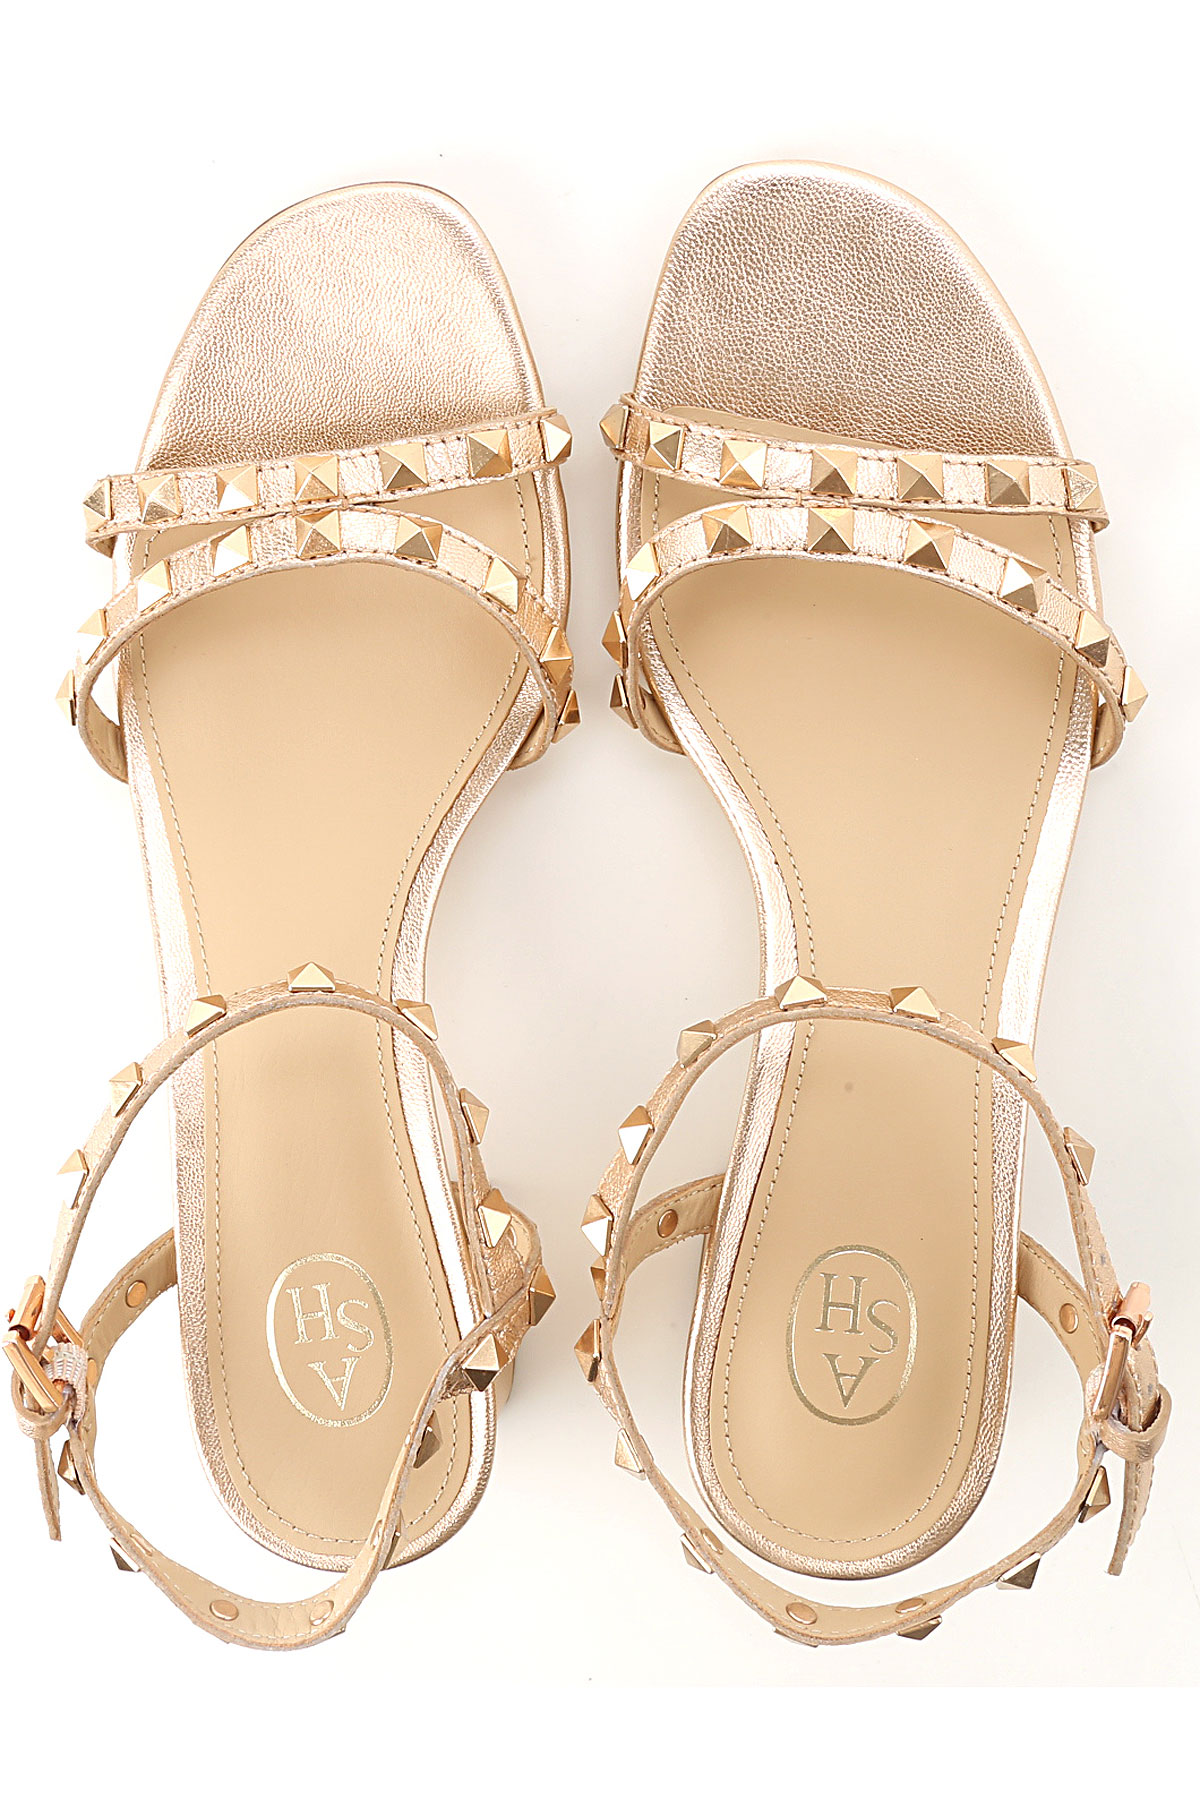 Mujer Primavera Cobre Ash nbsp; Para verano 2019 Zapatos qzz67